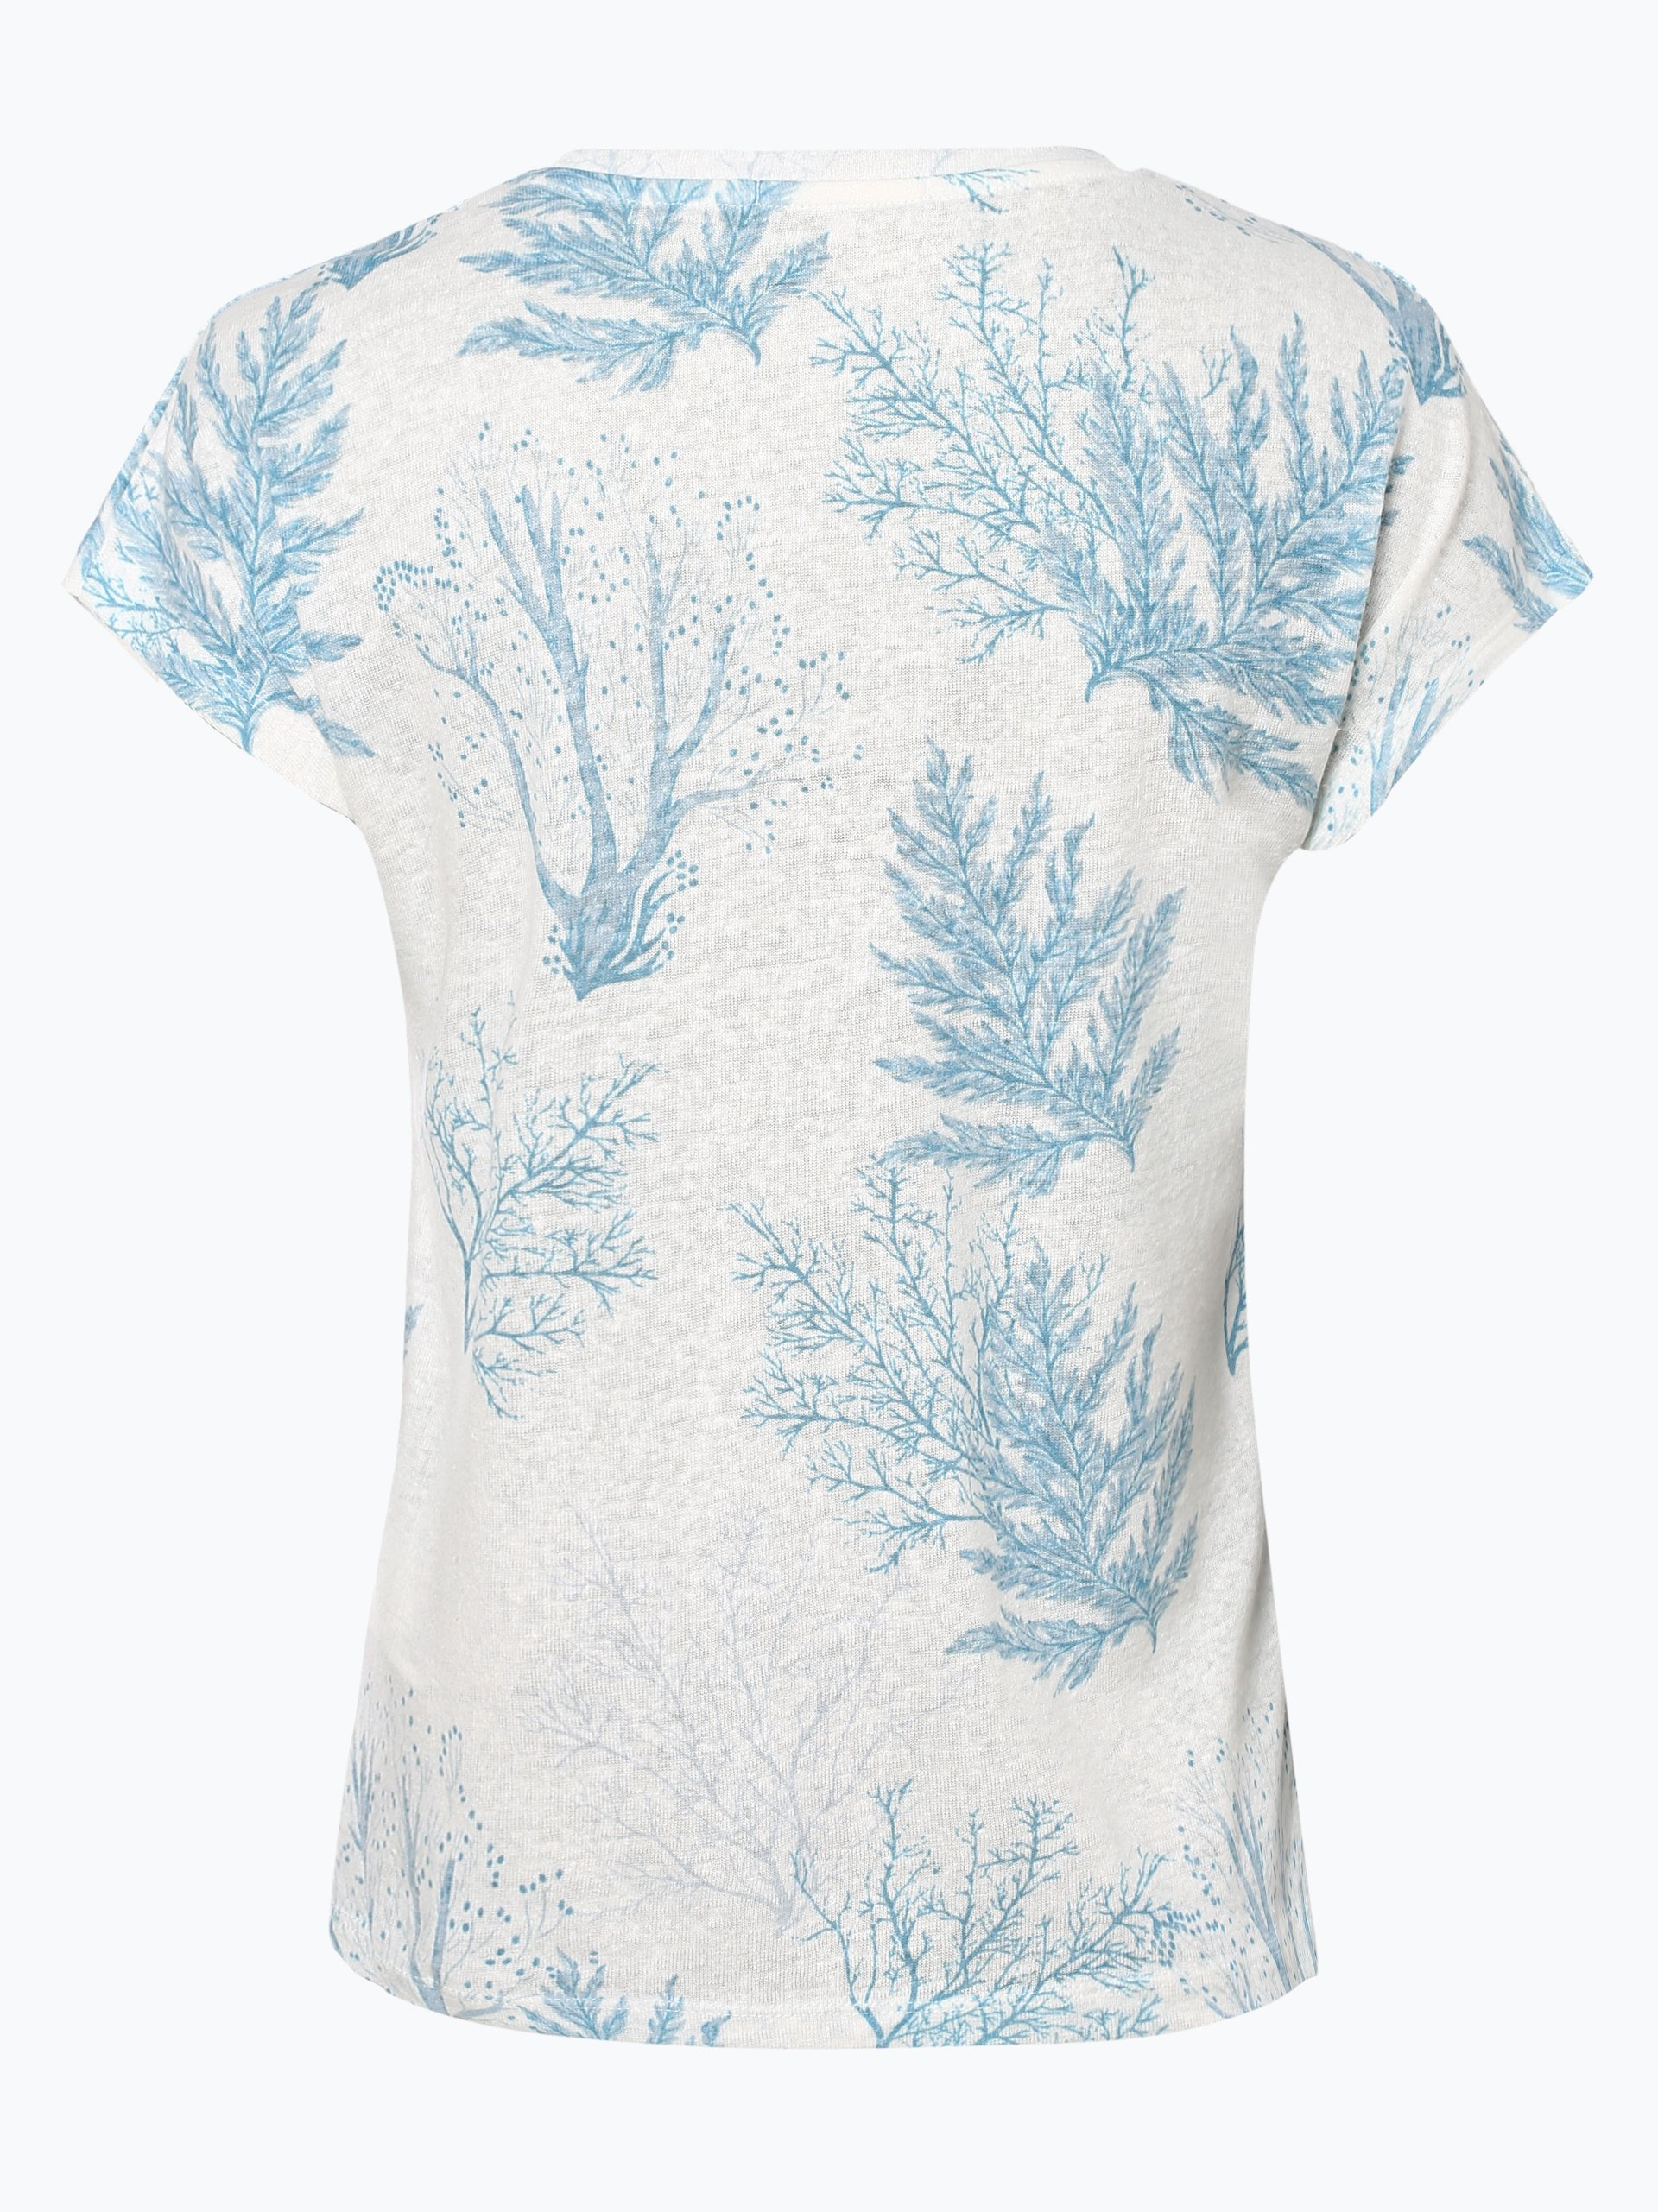 Pepe Jeans Damen T-Shirt mit Leinen-Anteil - Avril